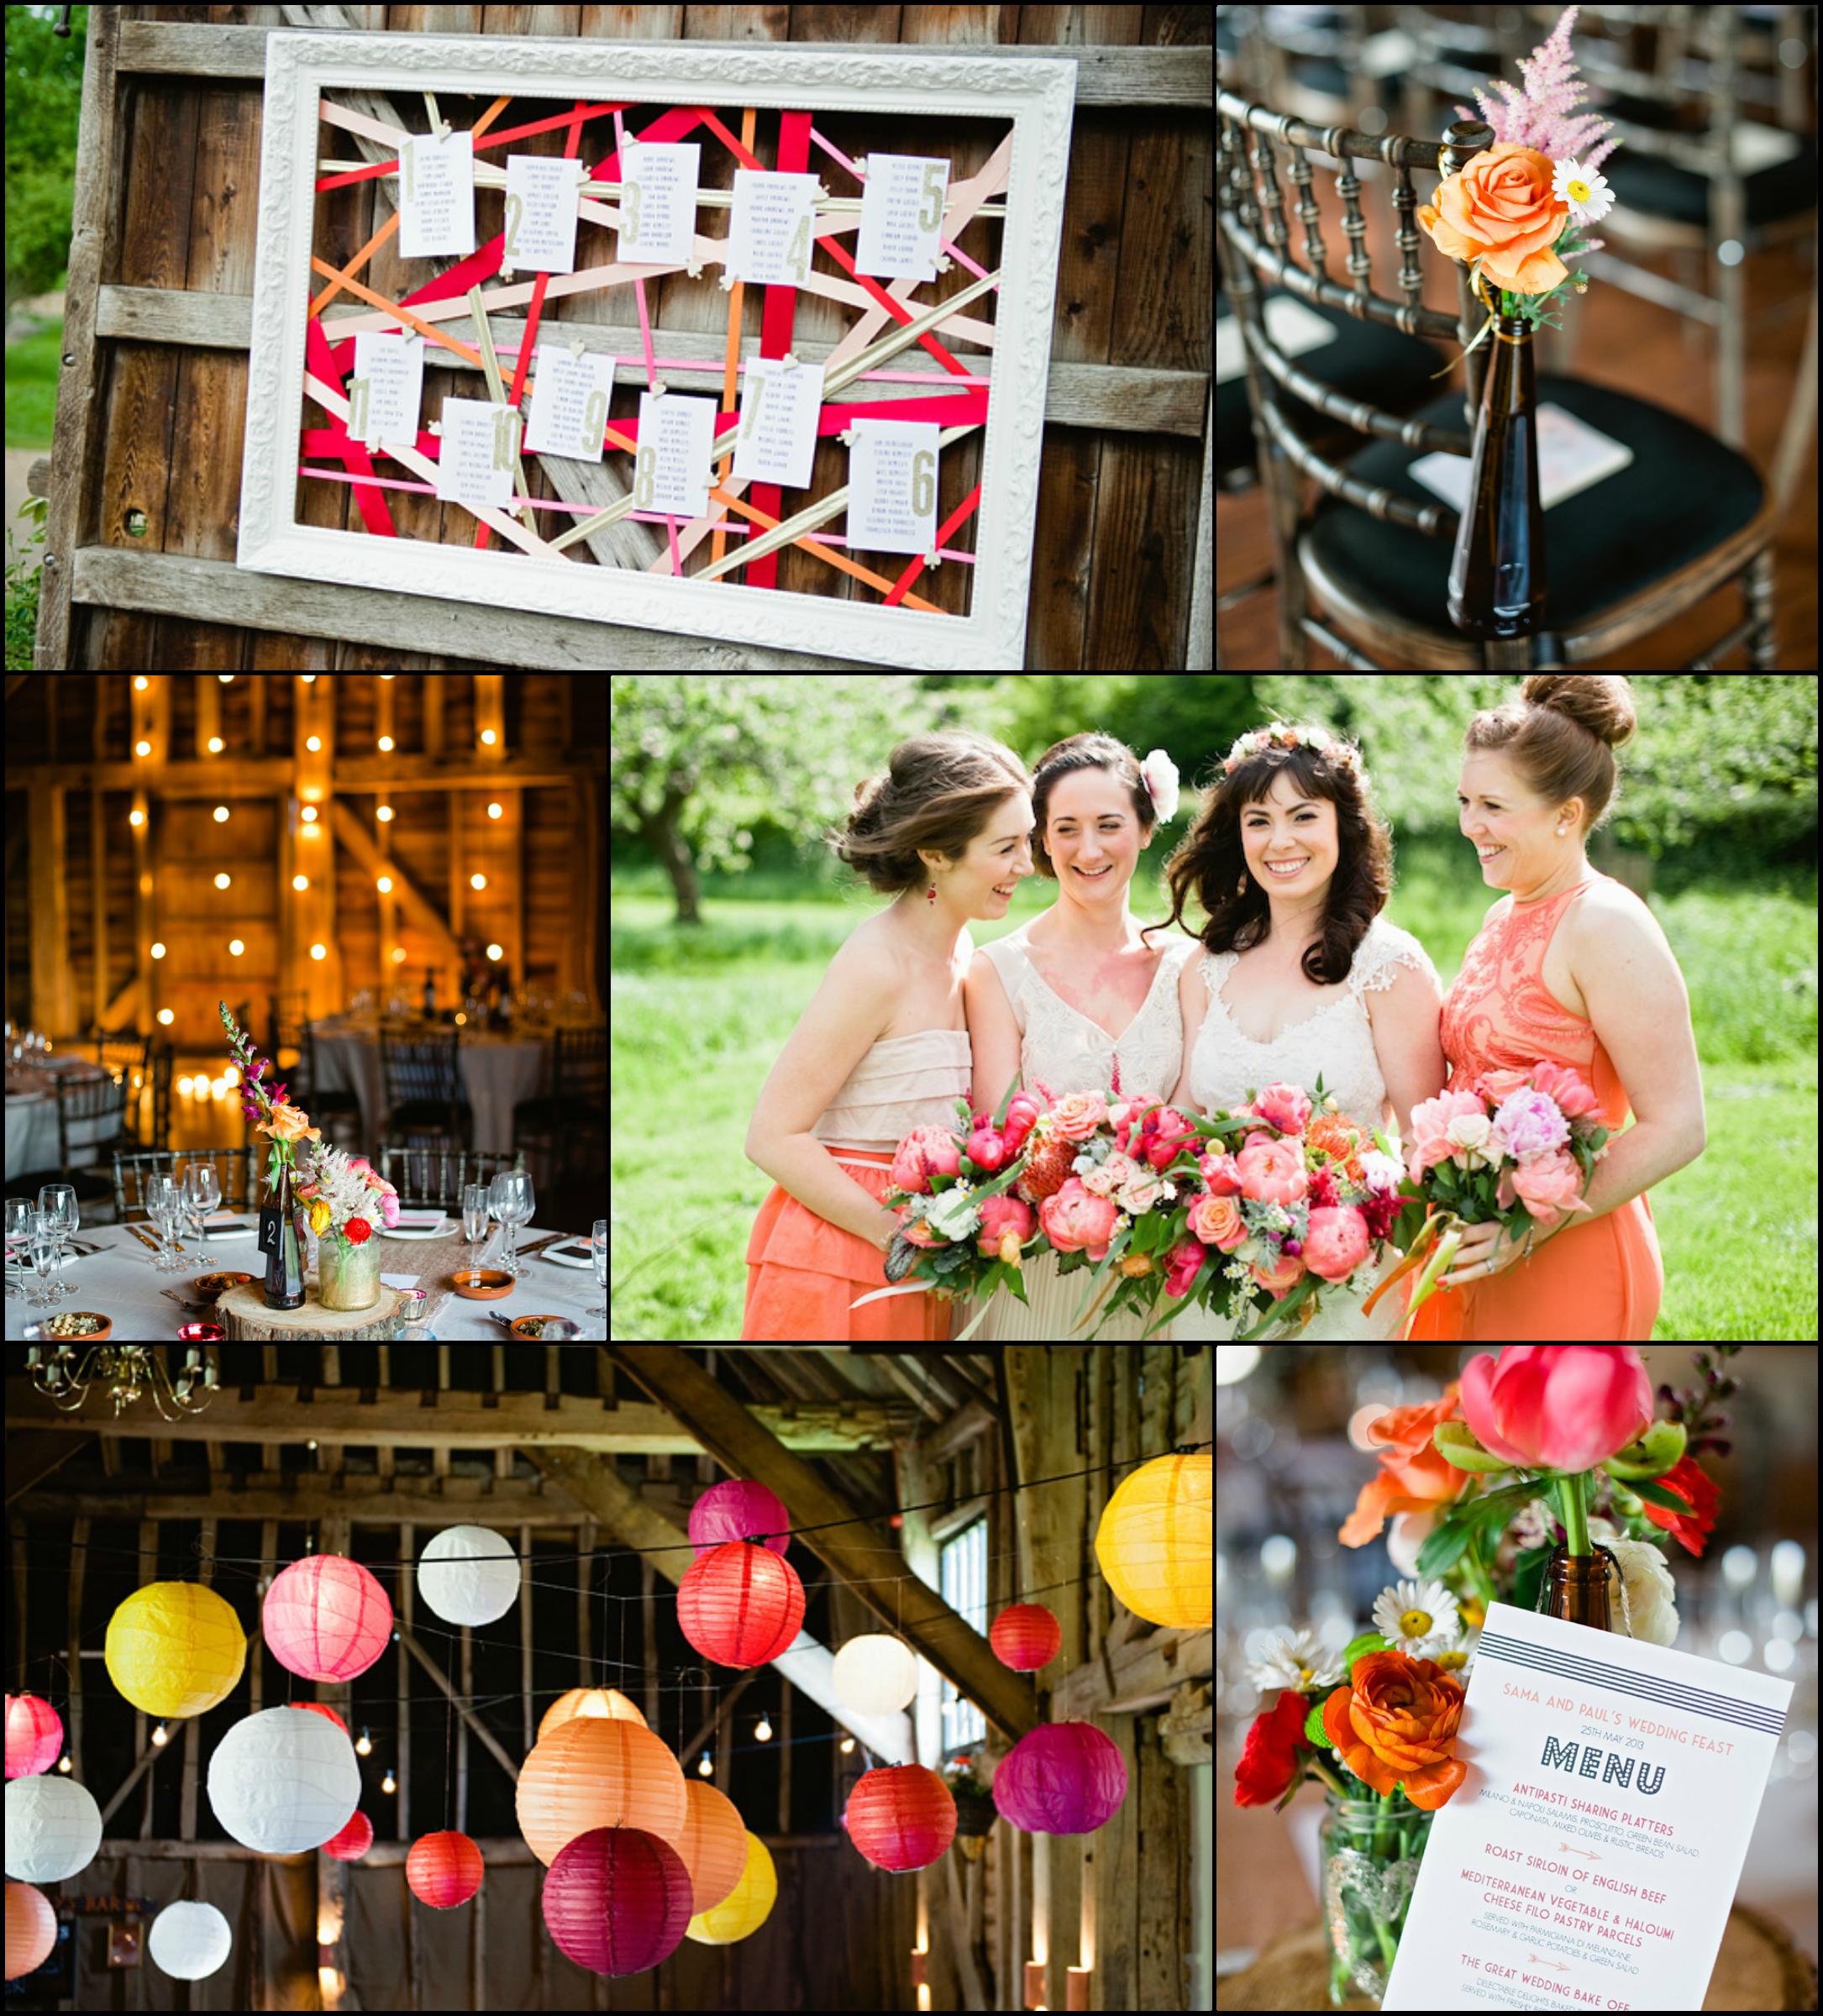 My 'Mexican- fiesta' inspired wedding